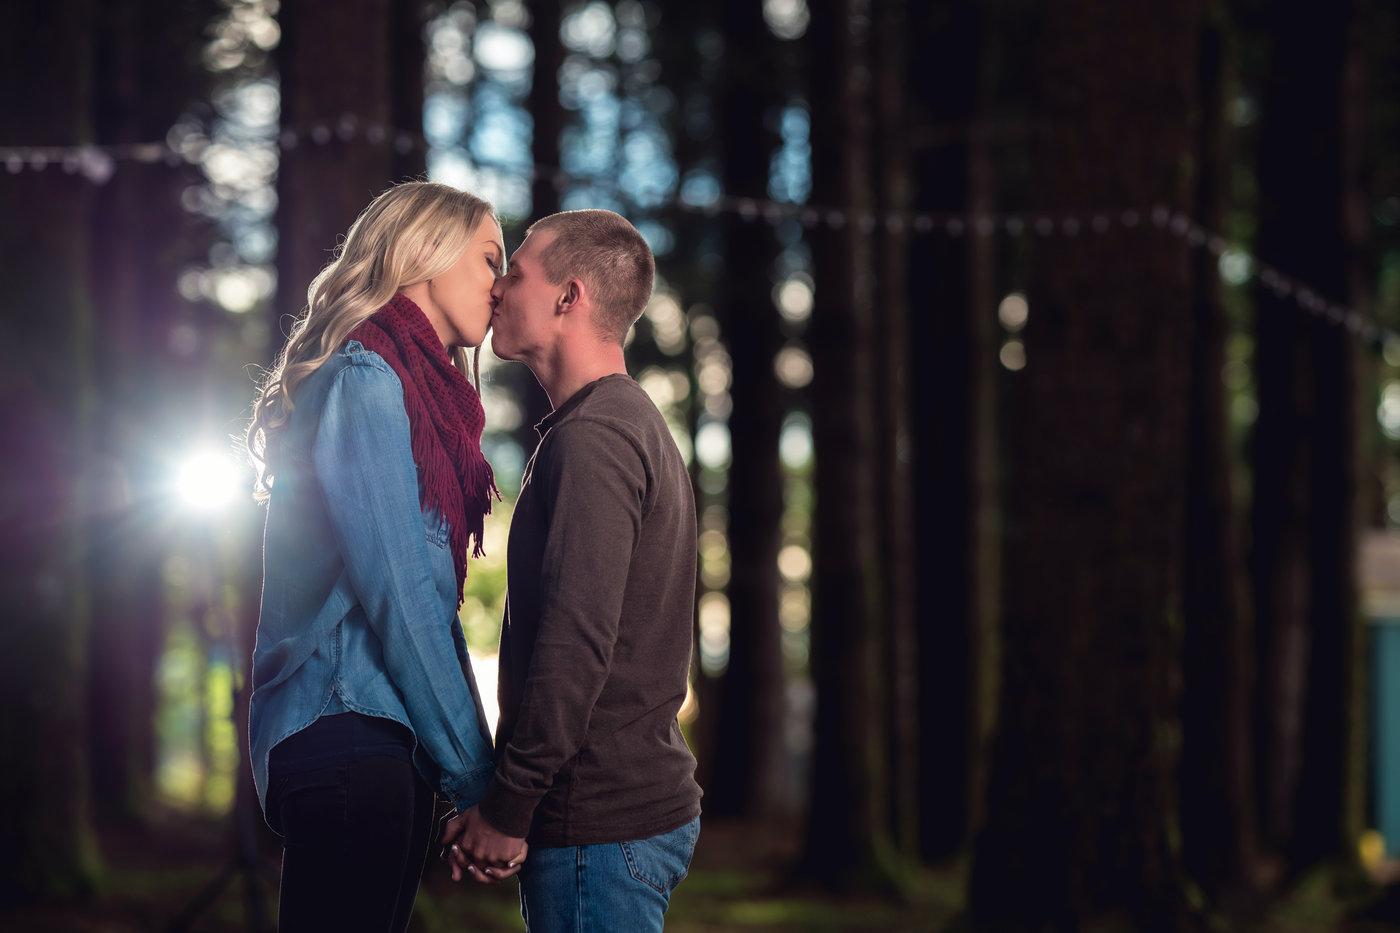 Engagement-engagement-0005.jpg